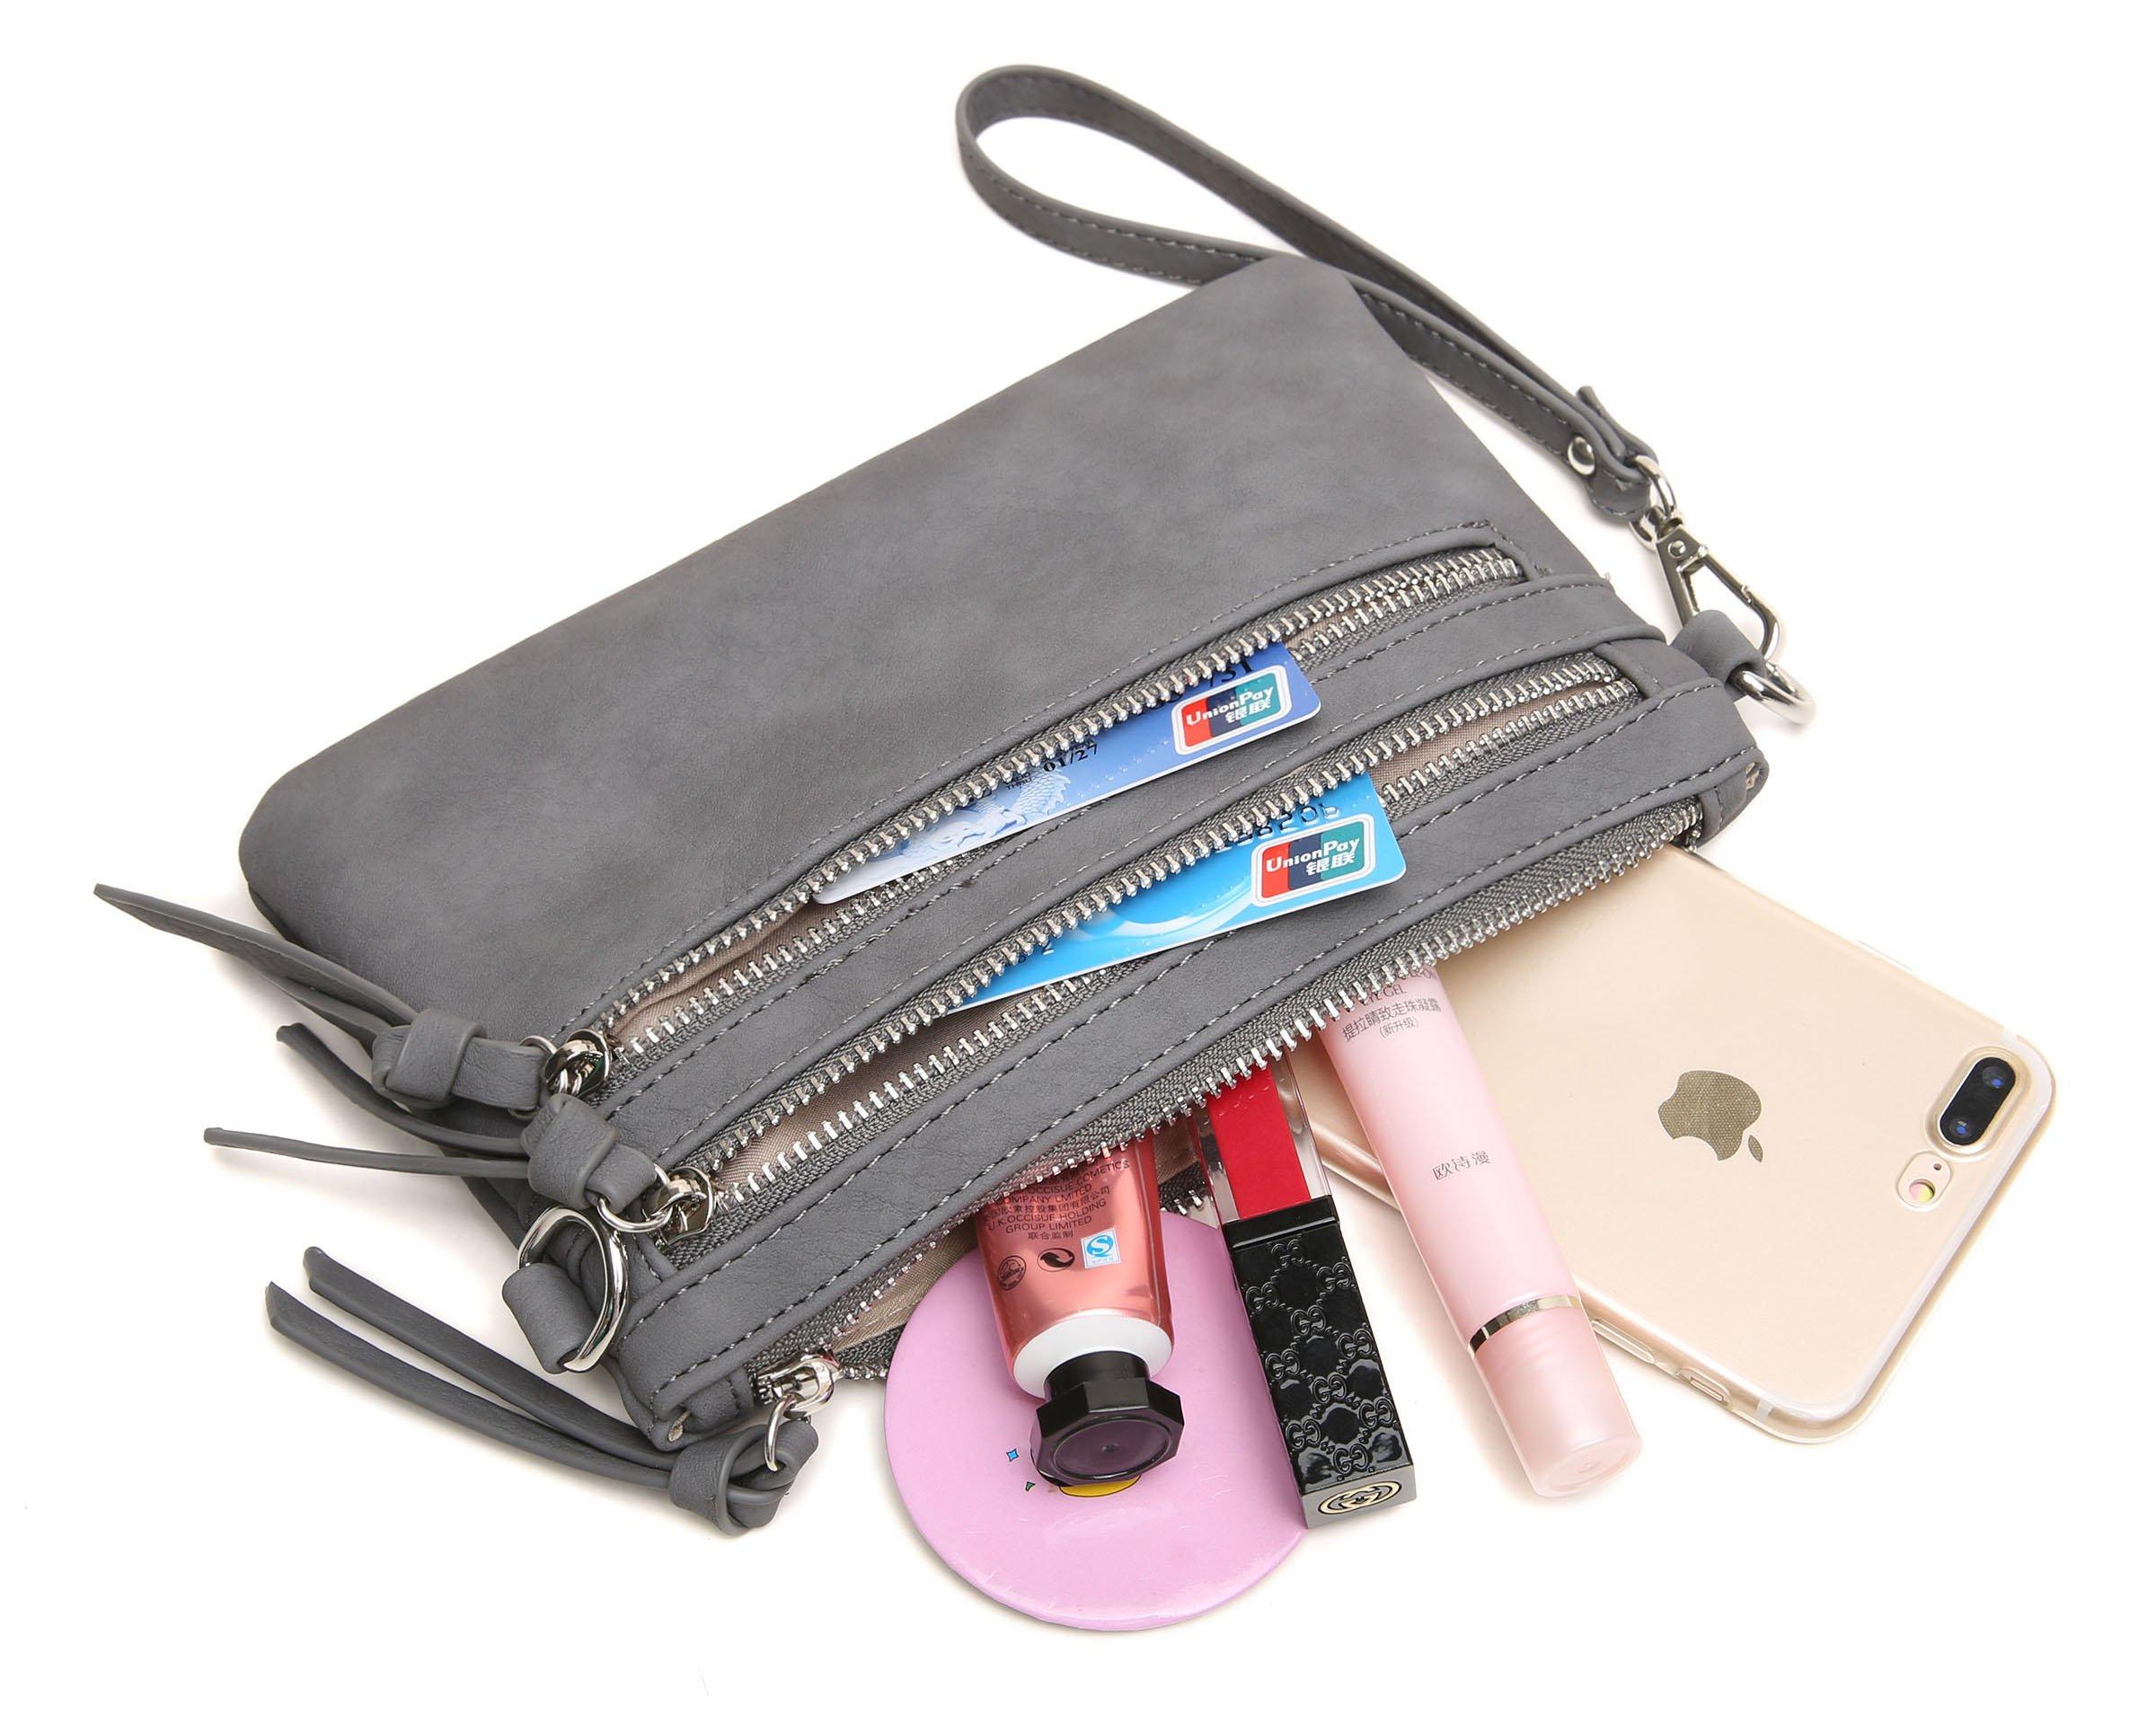 Aitbags Multi-Zipper Pocket Crossbody Handbag Lightweight Purse Functional Clutch with Wristlet by Aitbags (Image #5)